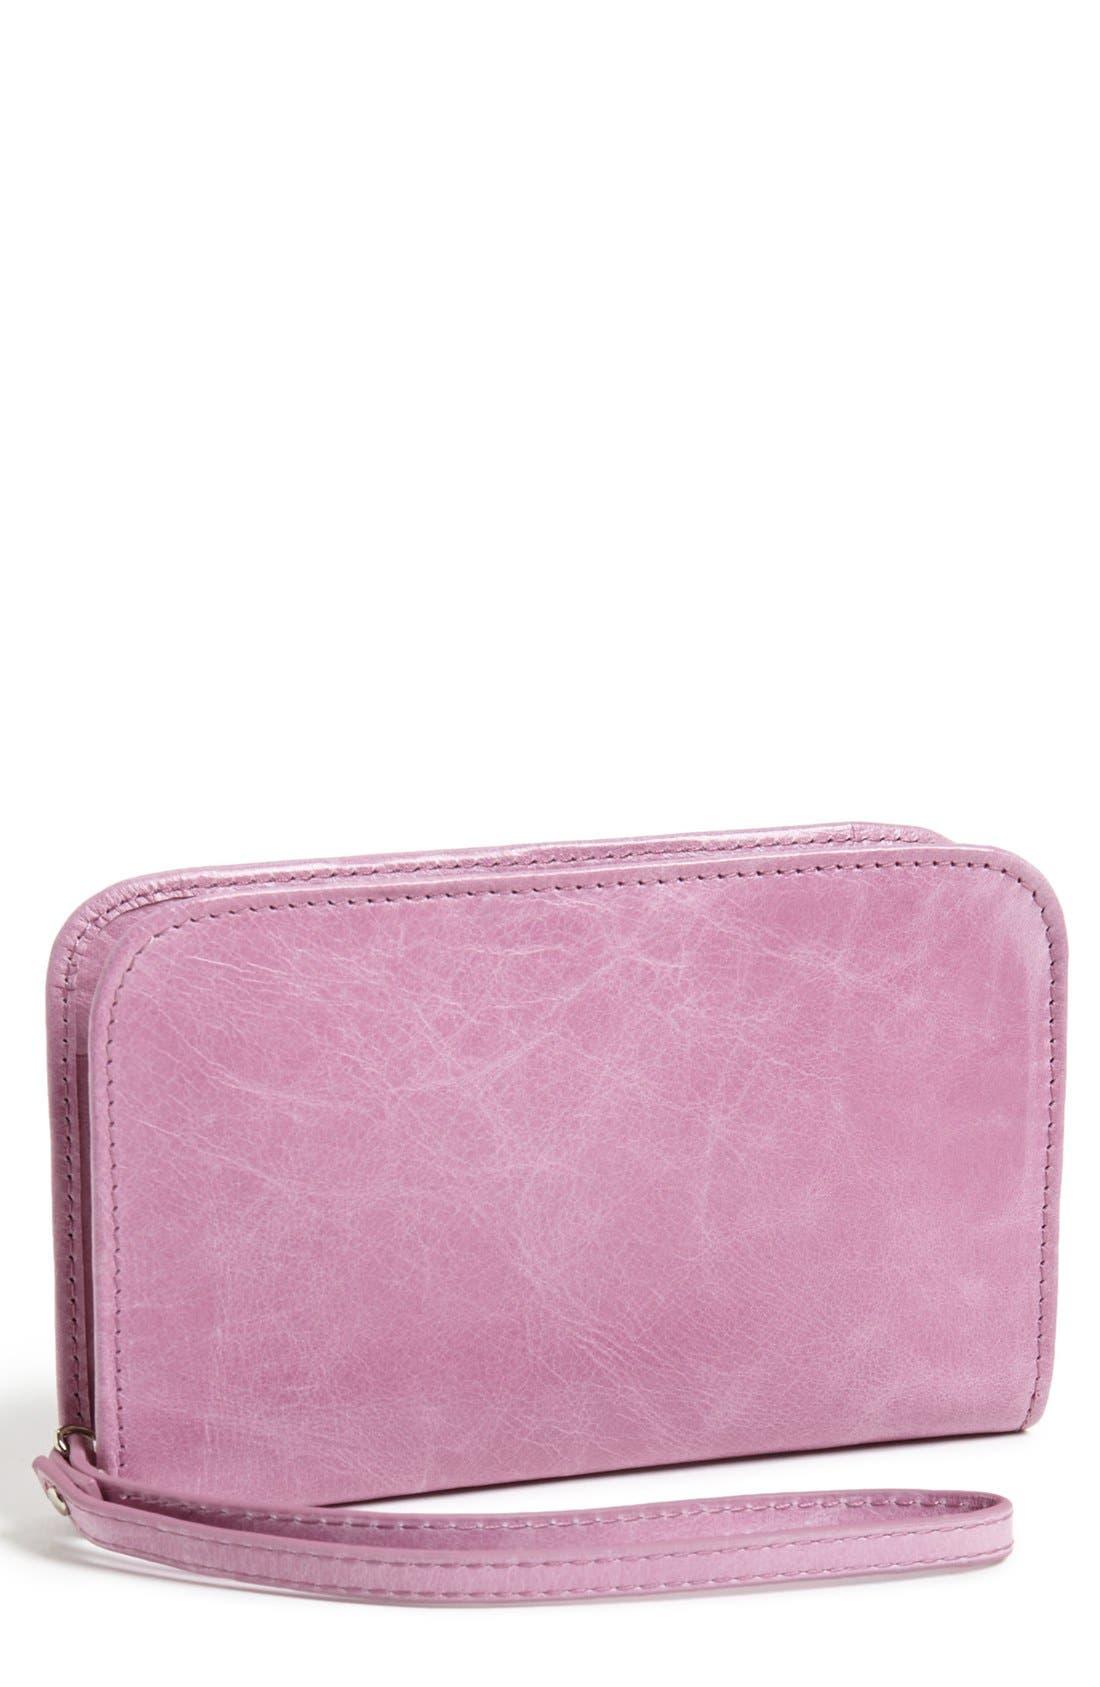 Alternate Image 1 Selected - Hobo 'Jess' Phone Wallet